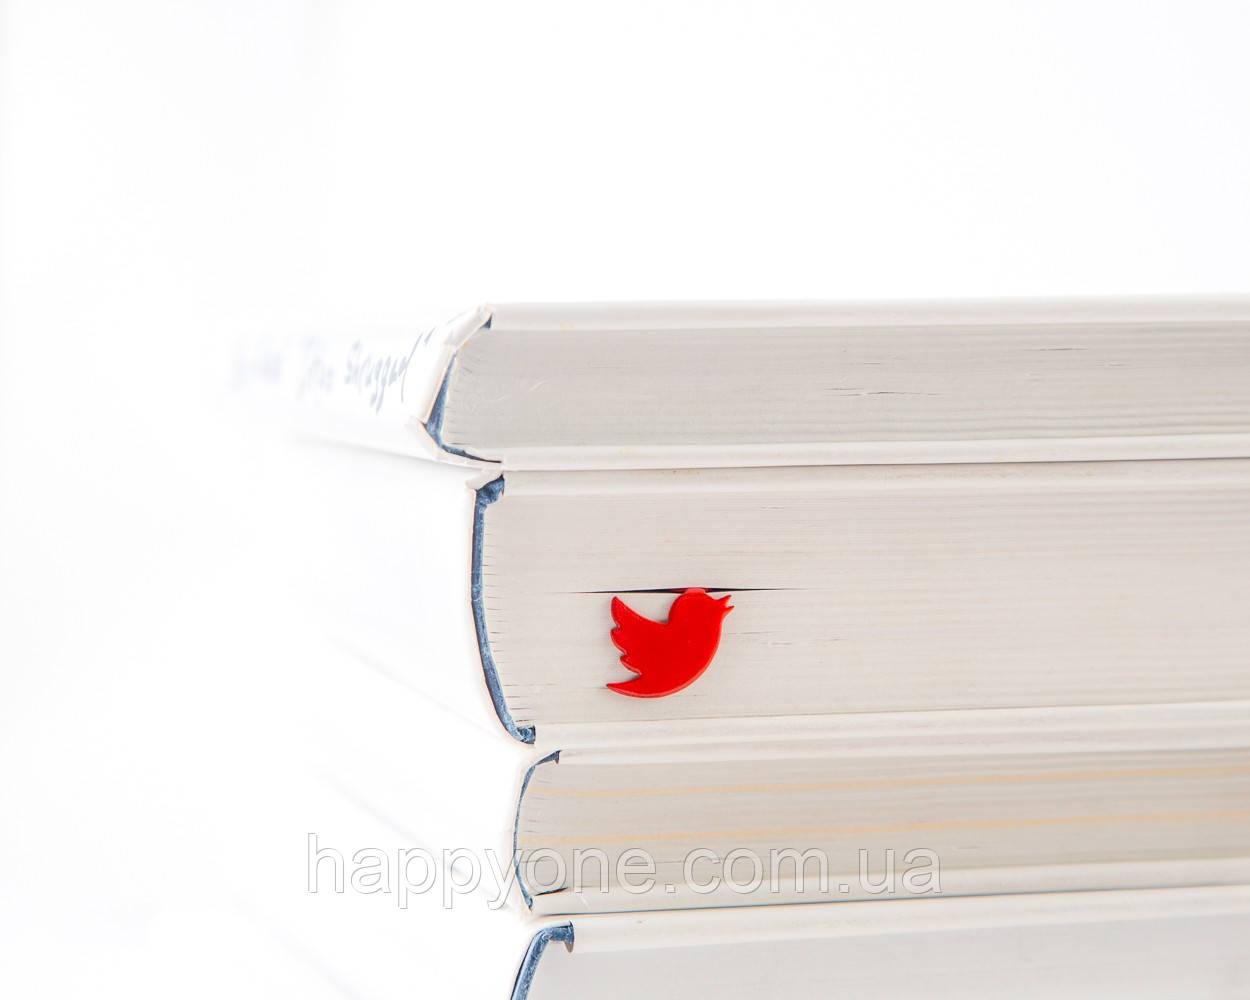 Закладка для книг Twitter